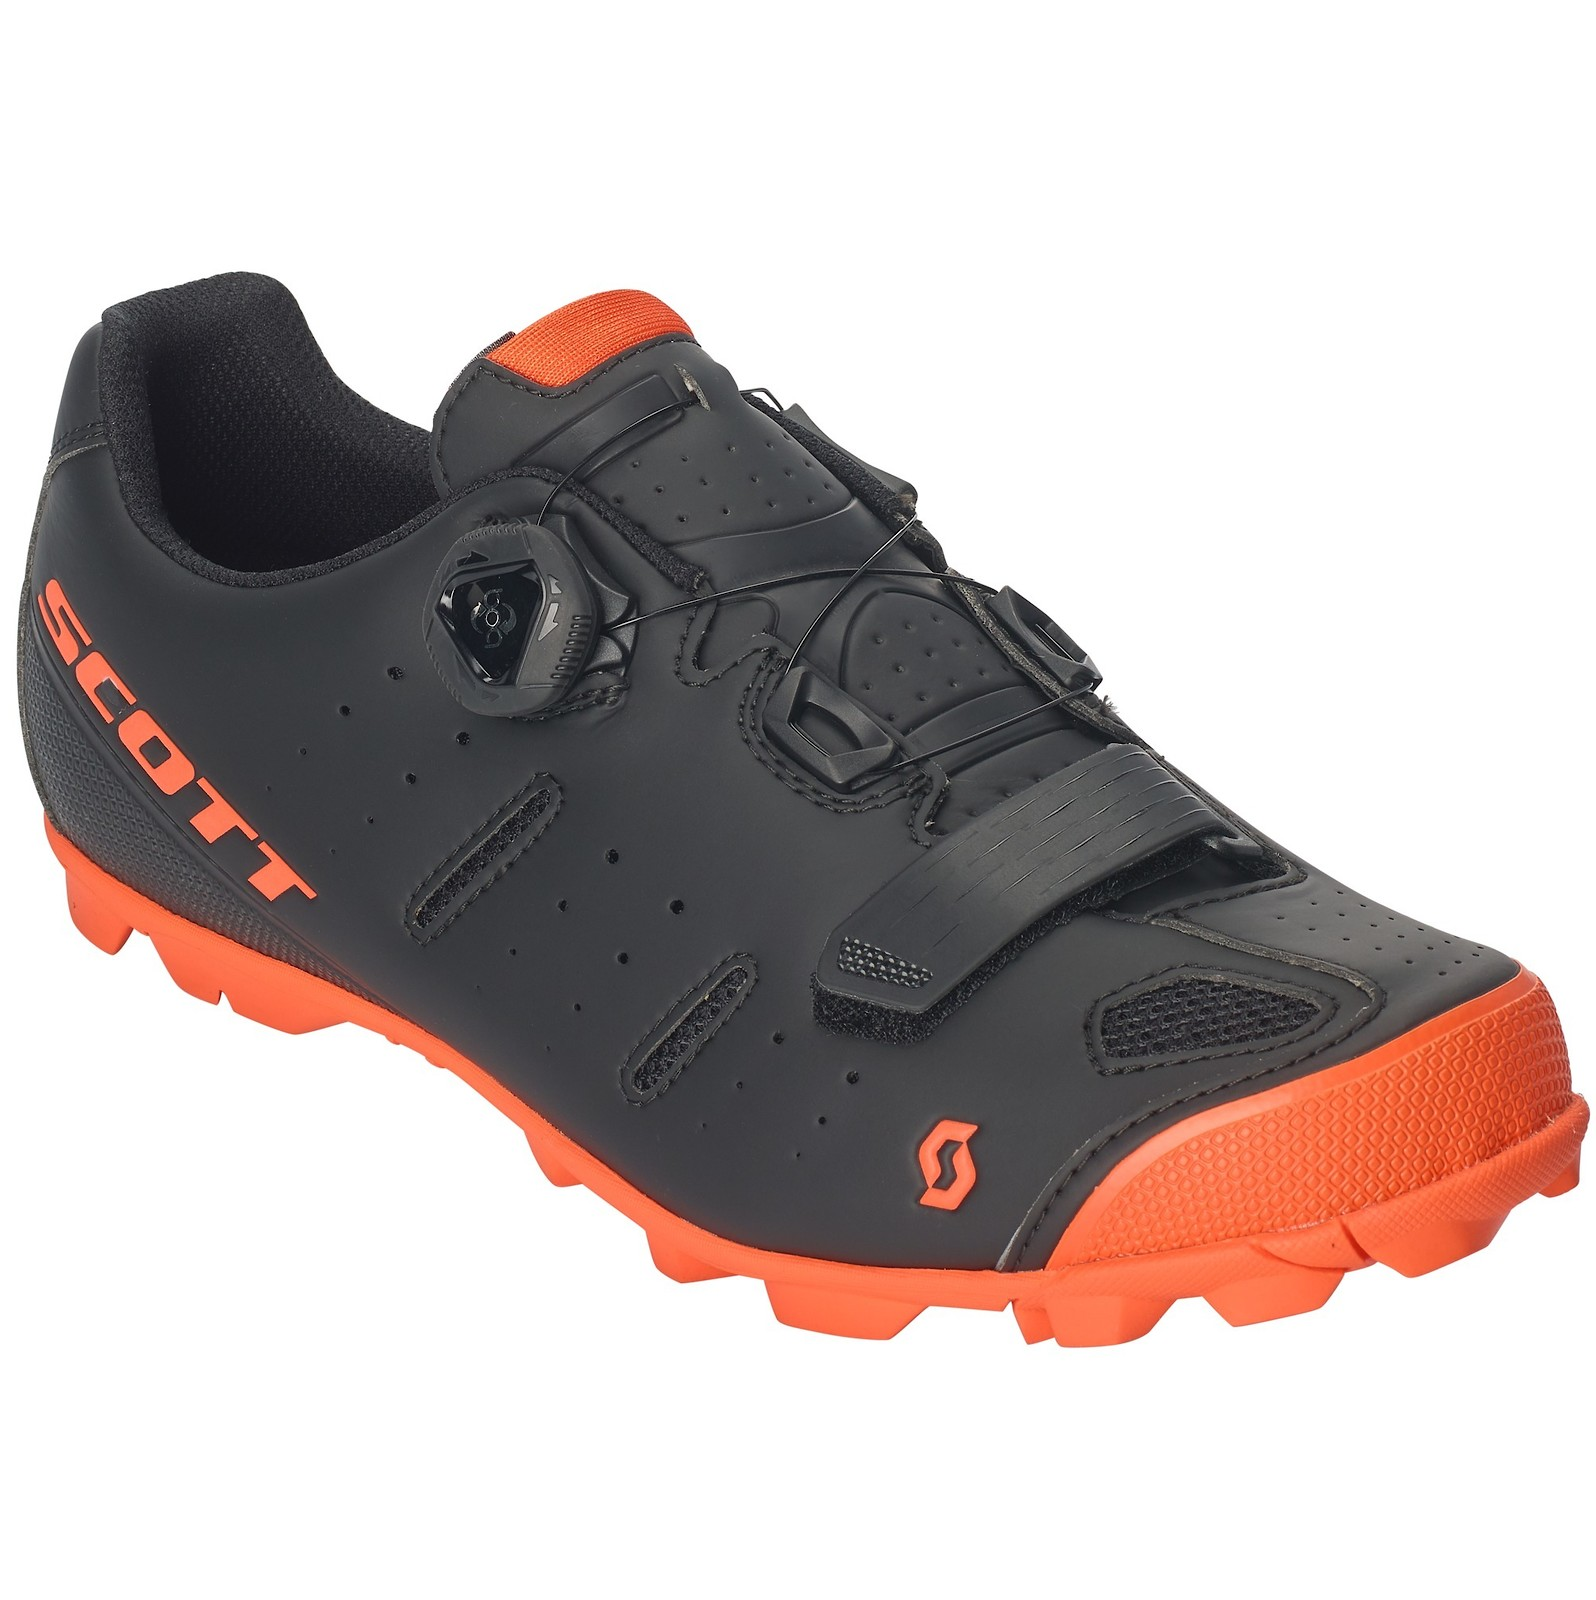 Scott Elite Boa shoe in matte black/neon orange